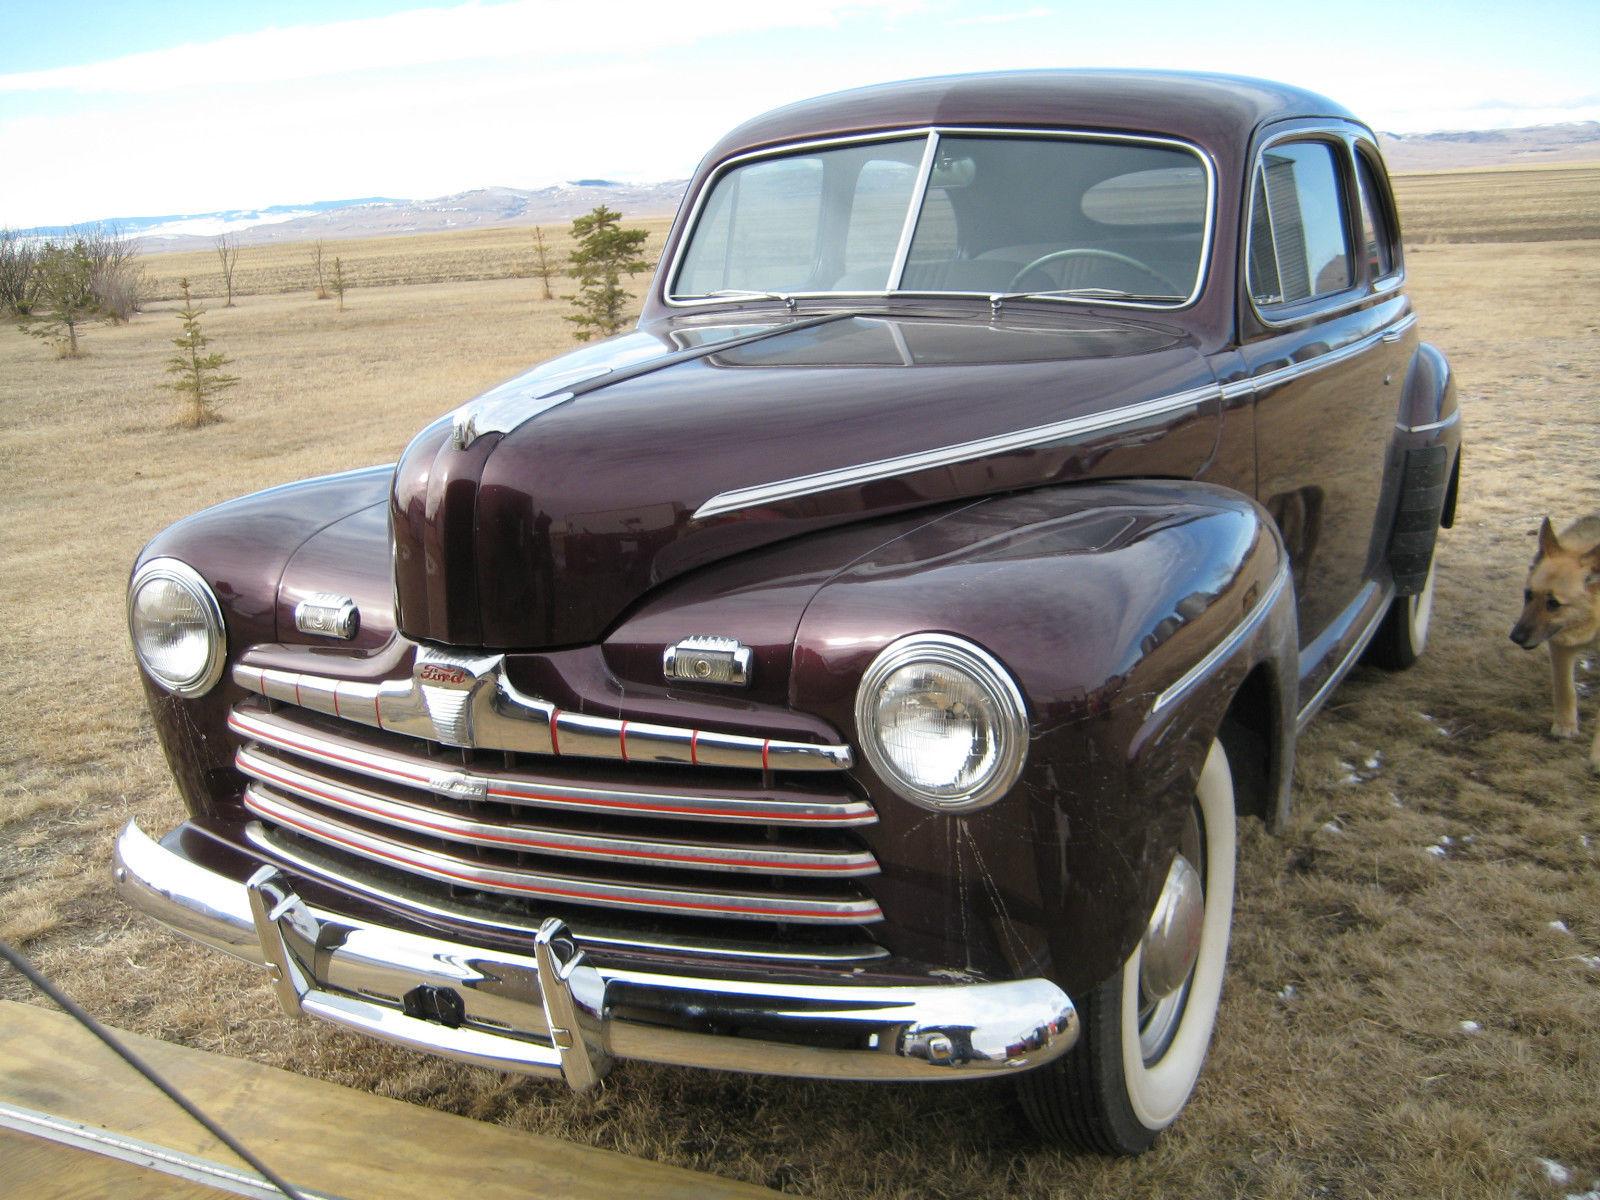 1946 ford 2 door sedan maroon burgandy for sale in for 1946 mercury 4 door sedan